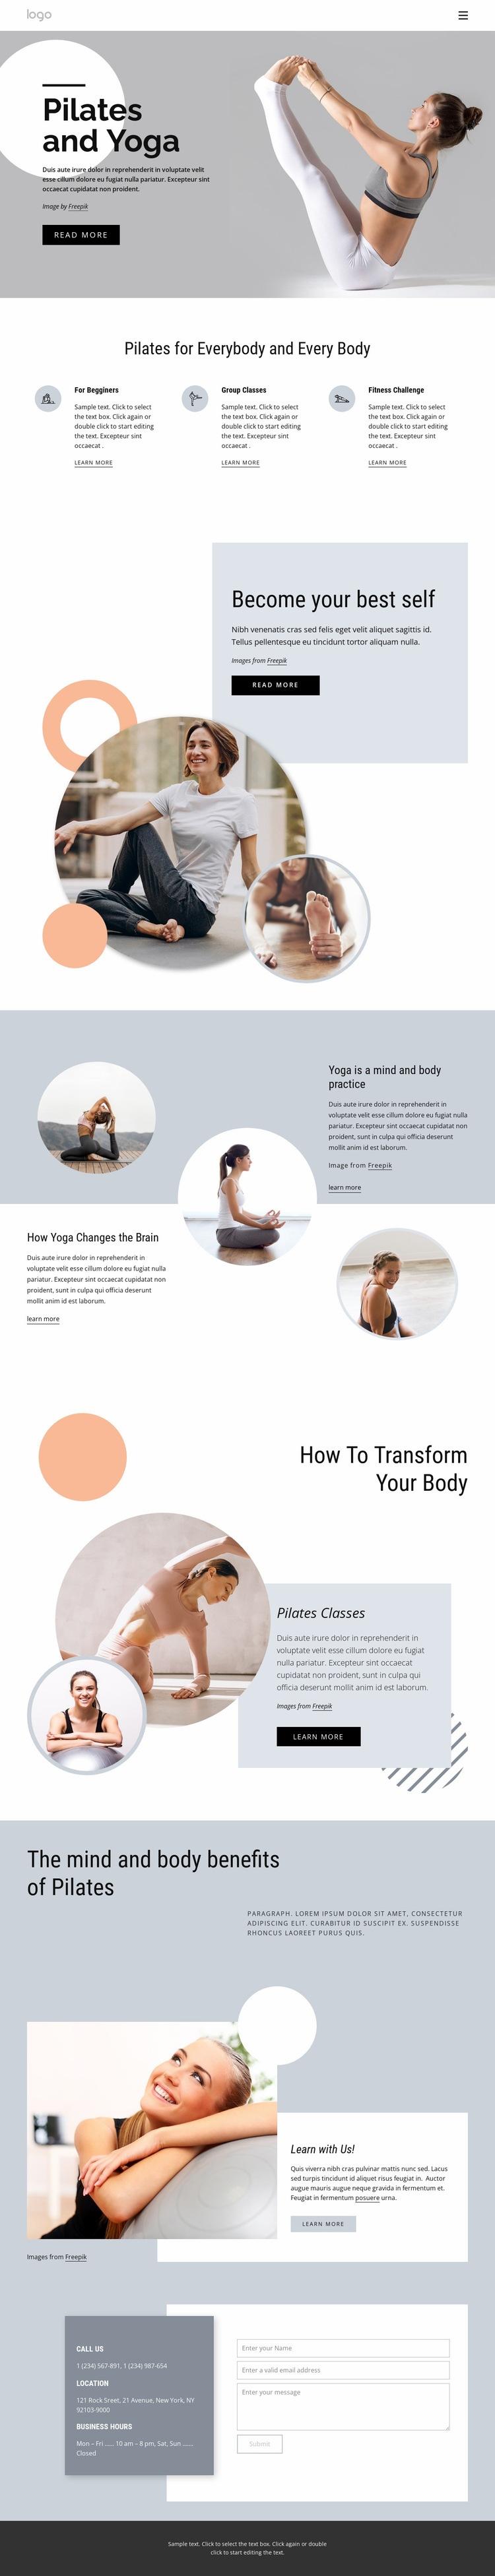 Pilates and yoga center Html Code